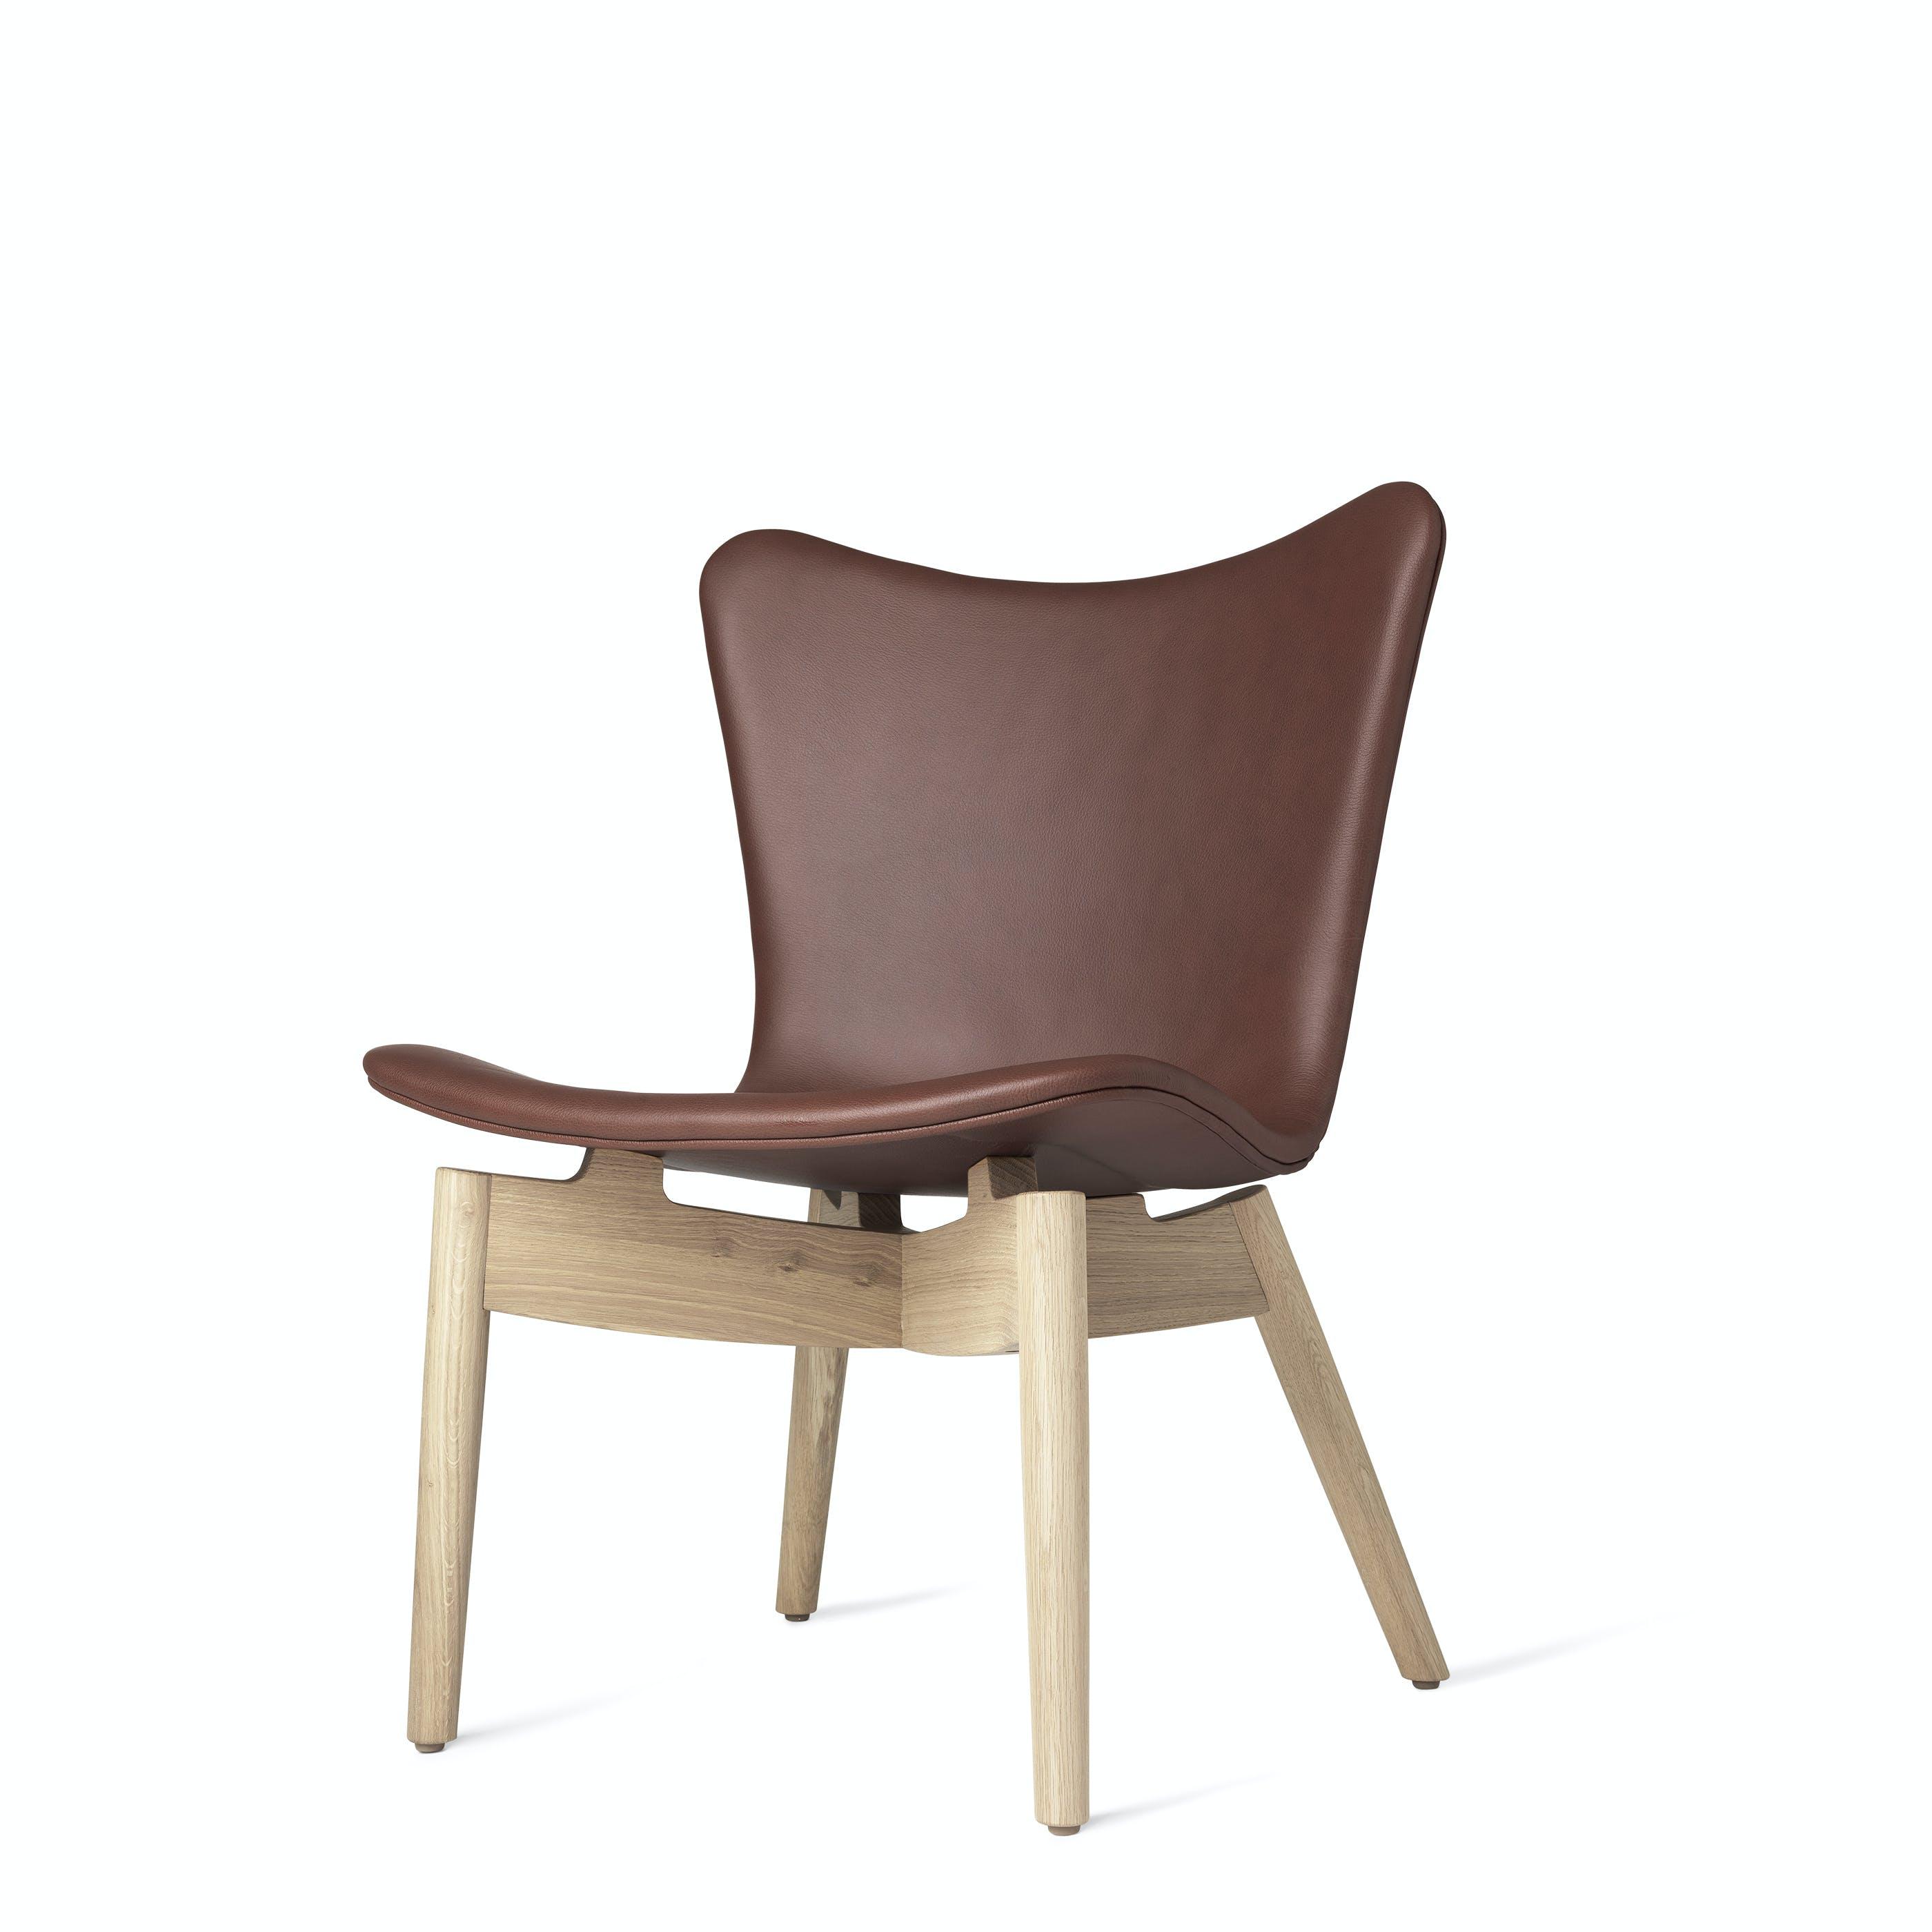 Mater Cognac Shell Lounge Chair Oak Legs Front Angle Haute Living